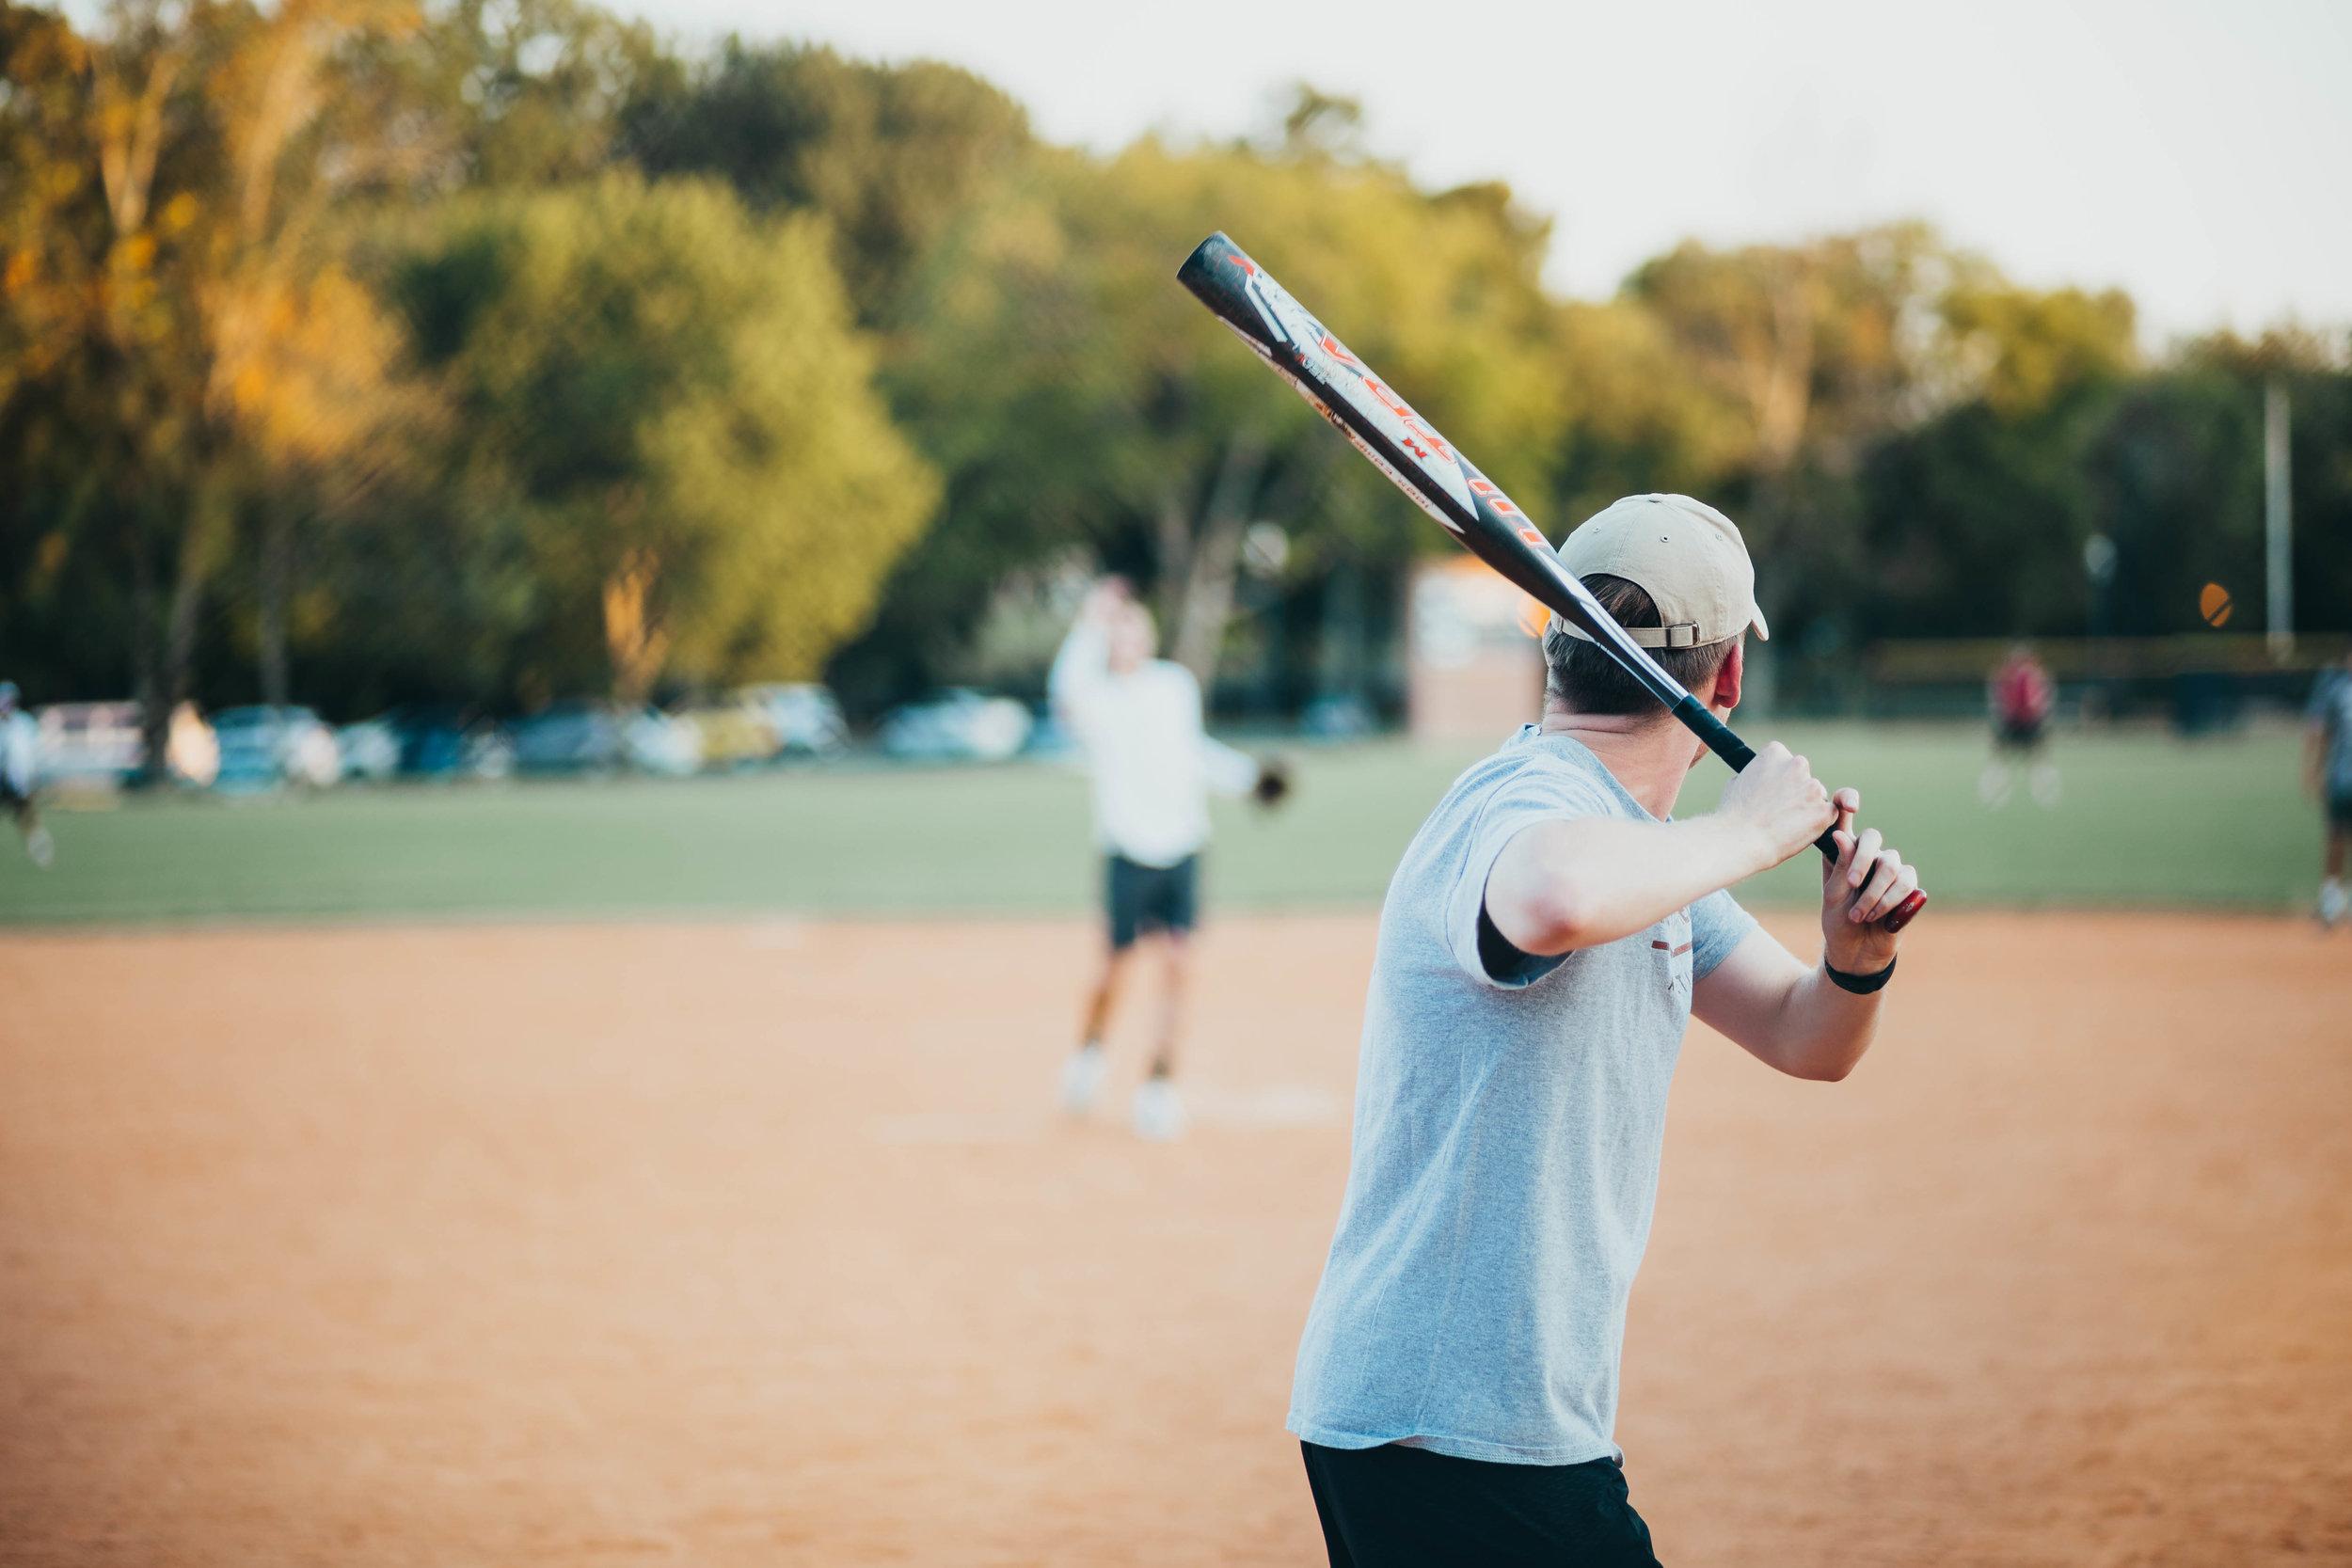 Seth Barnett up to bat for the TKO softball team. All photos by Sydney Pressley.